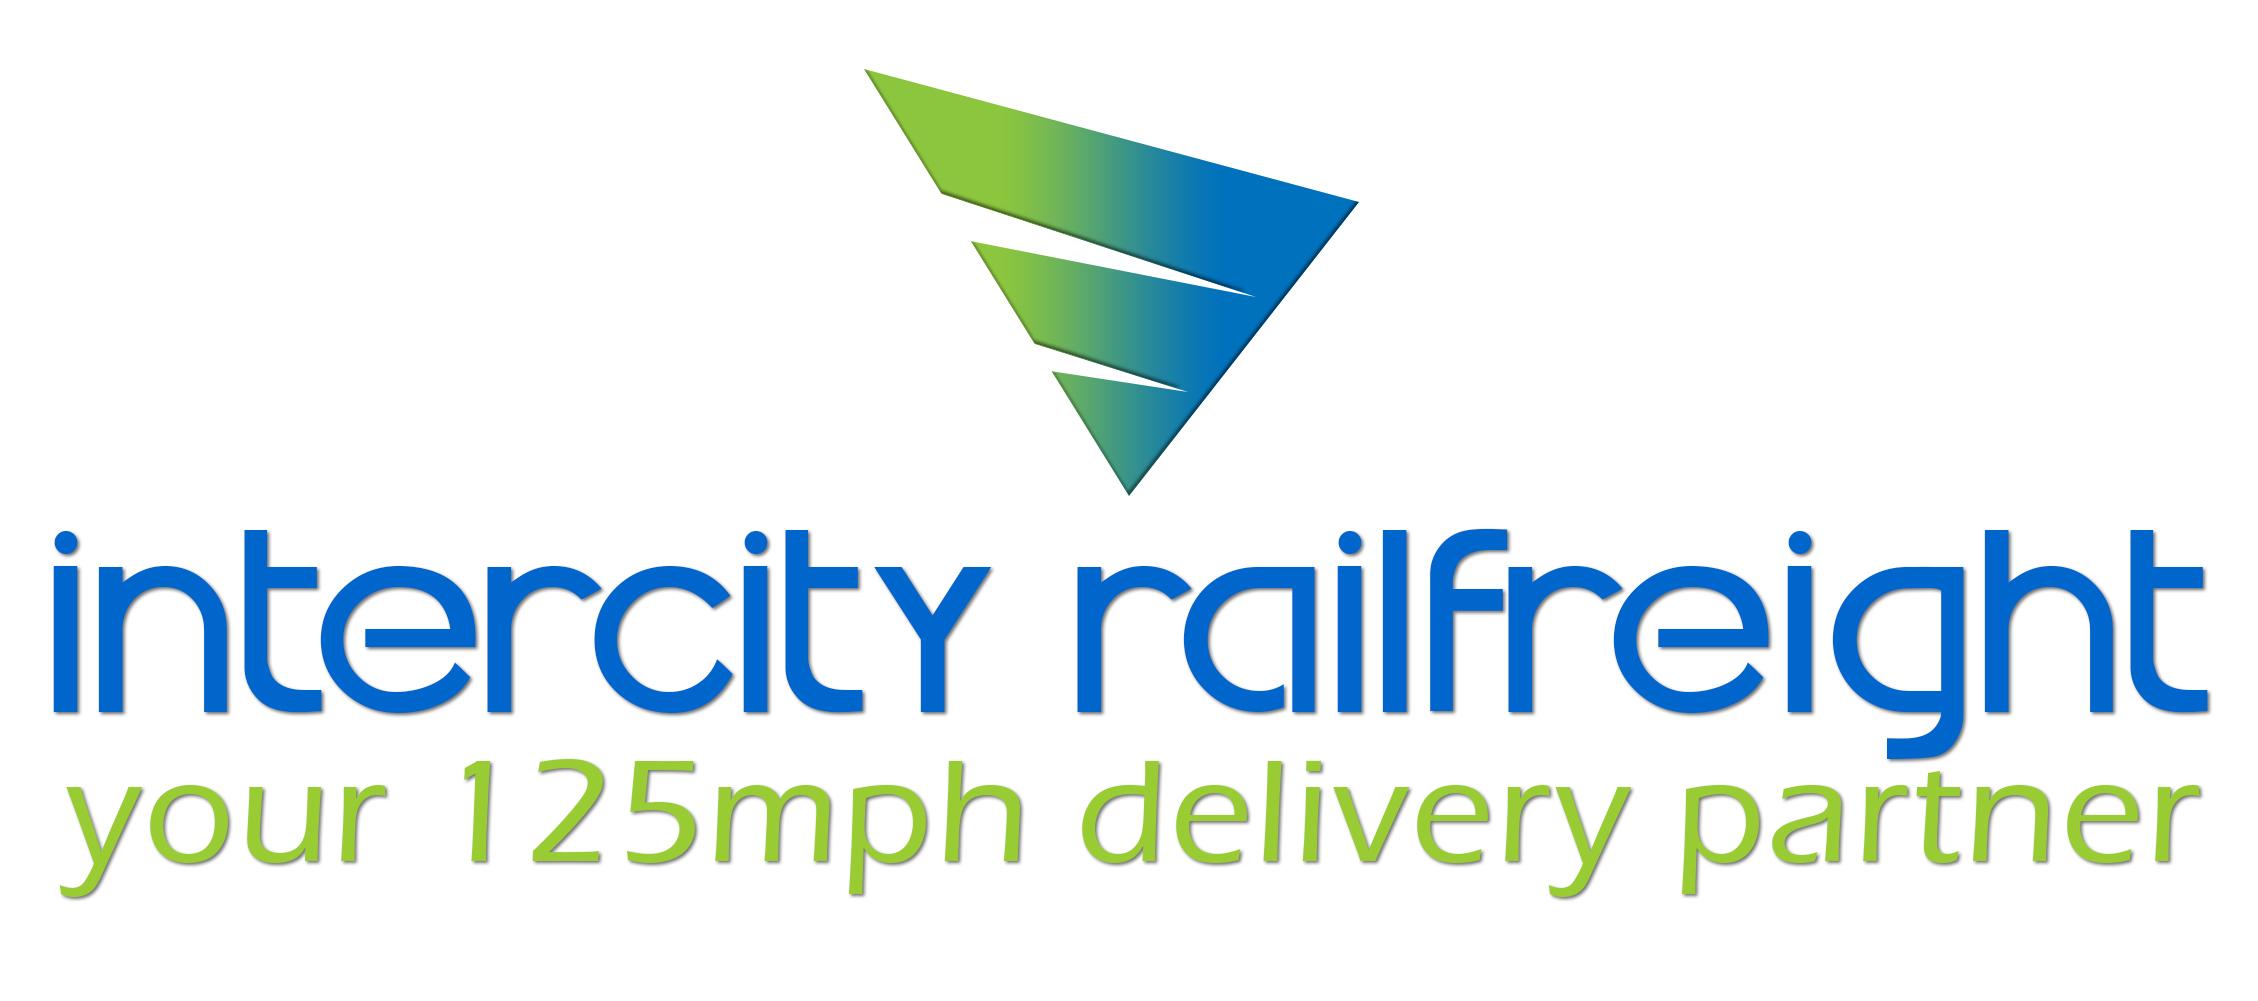 Intercity Railfreight